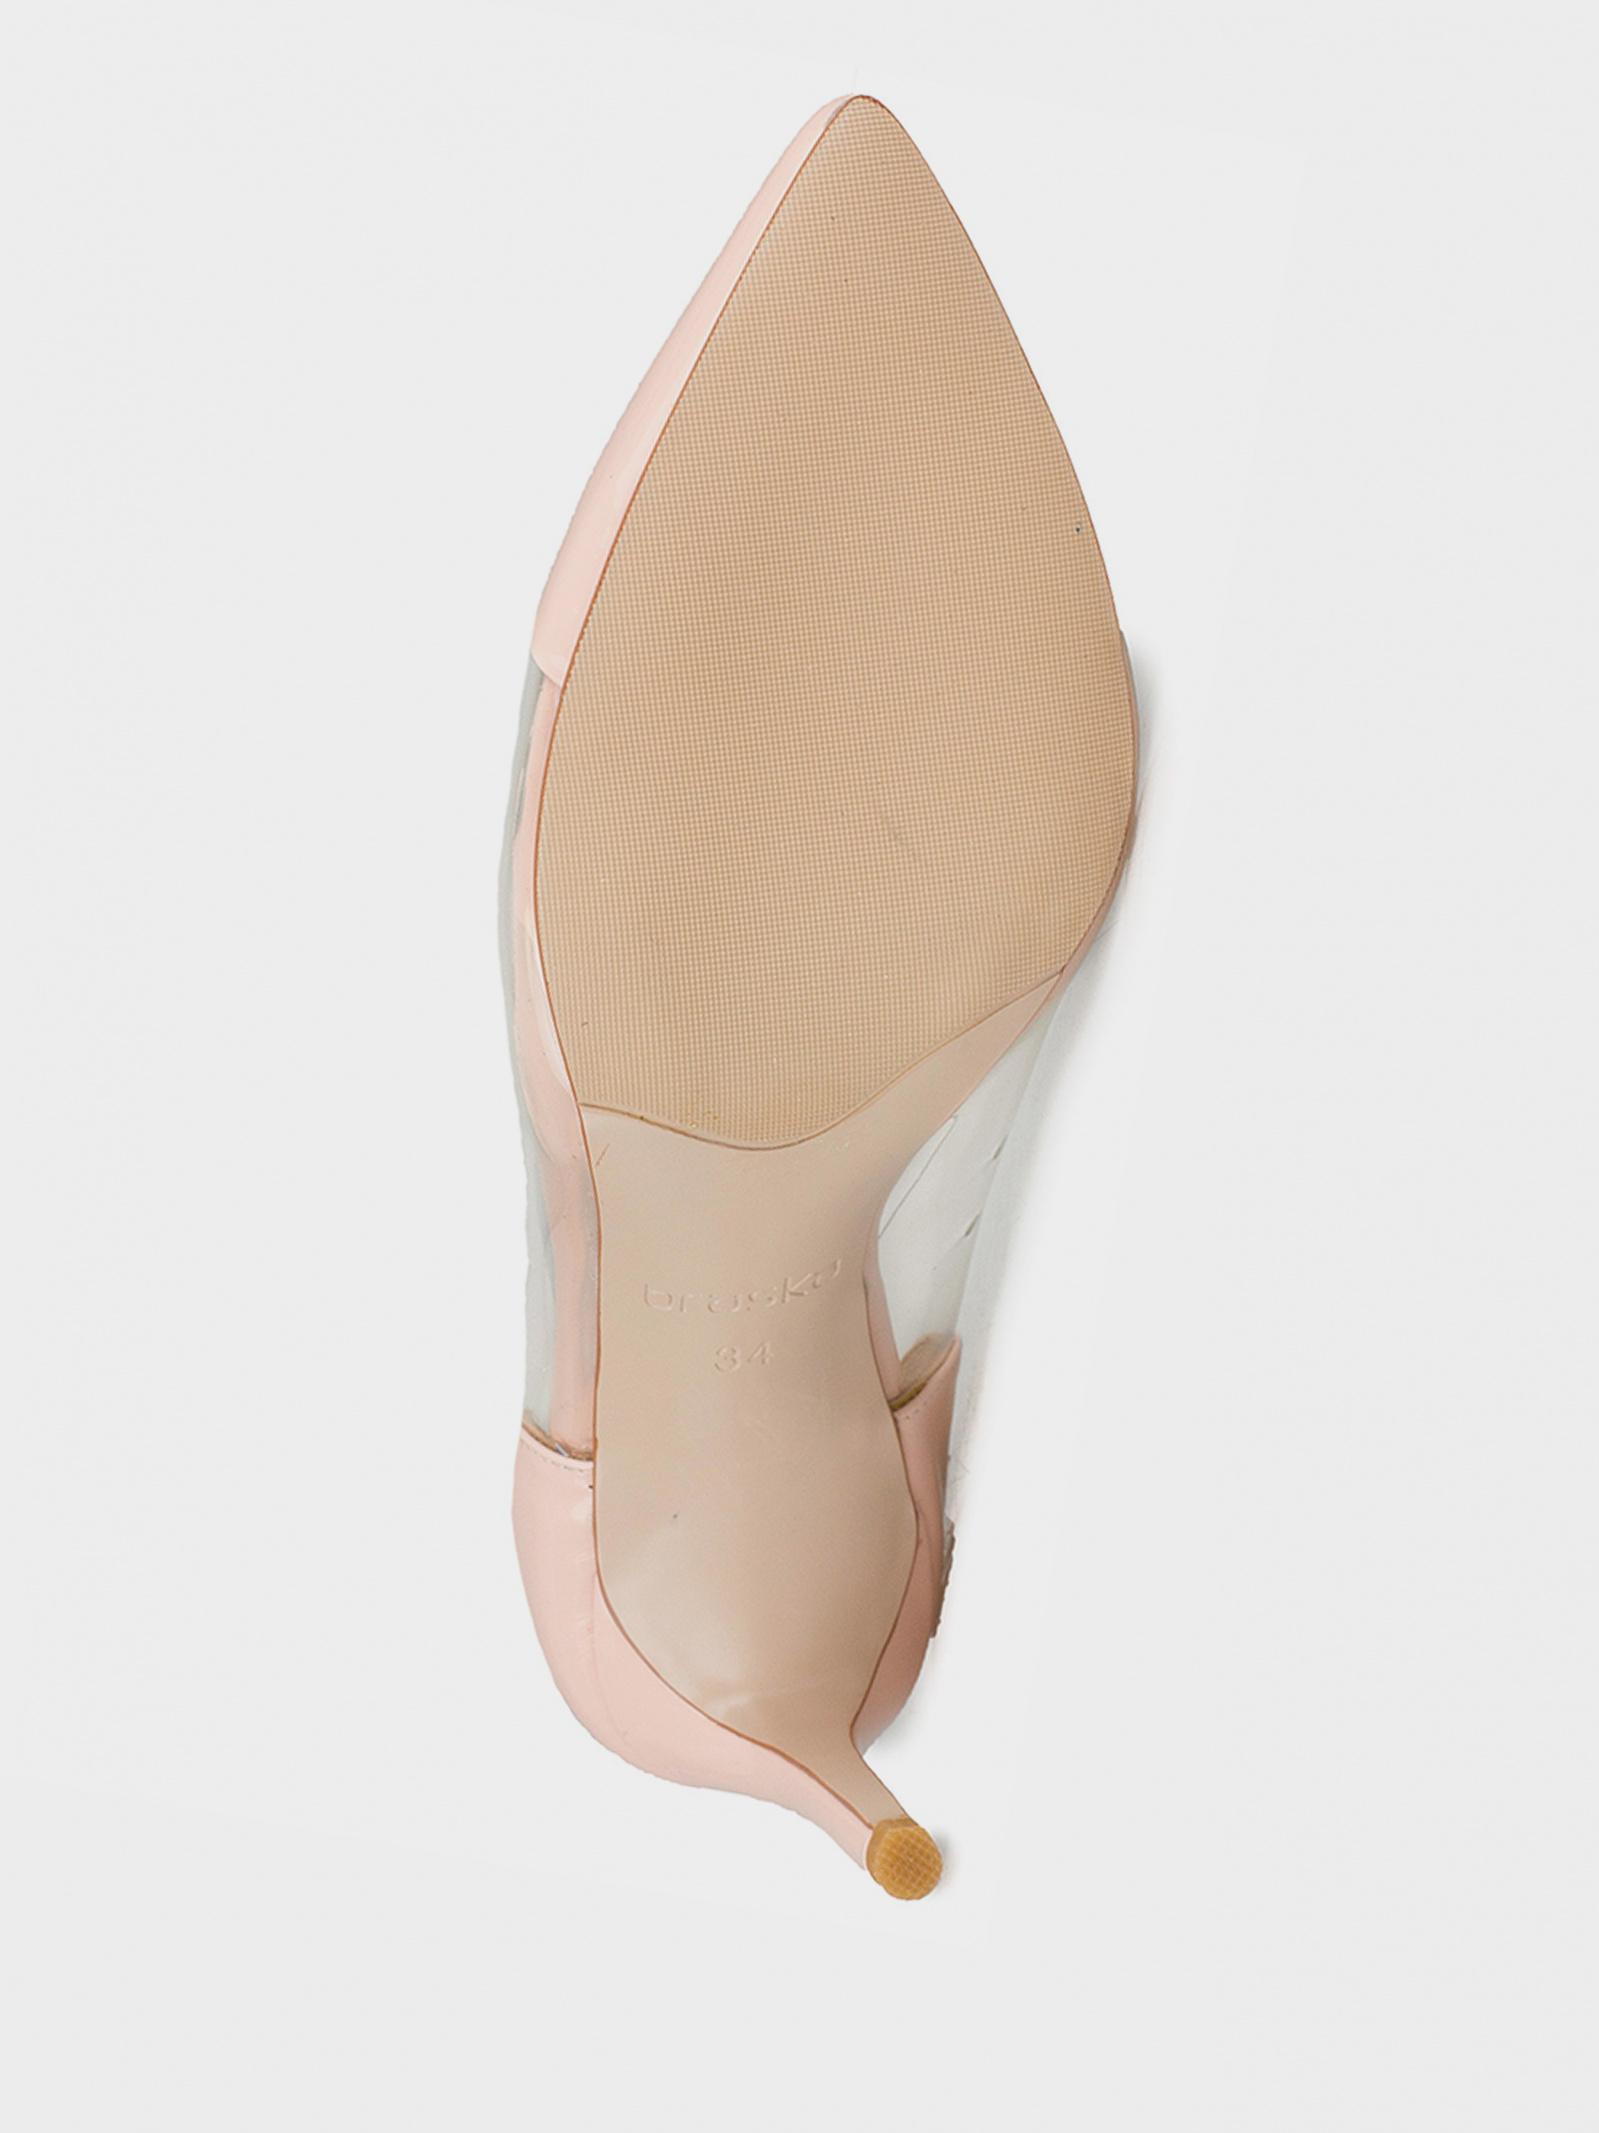 Туфли для женщин Braska BS2929 цена, 2017